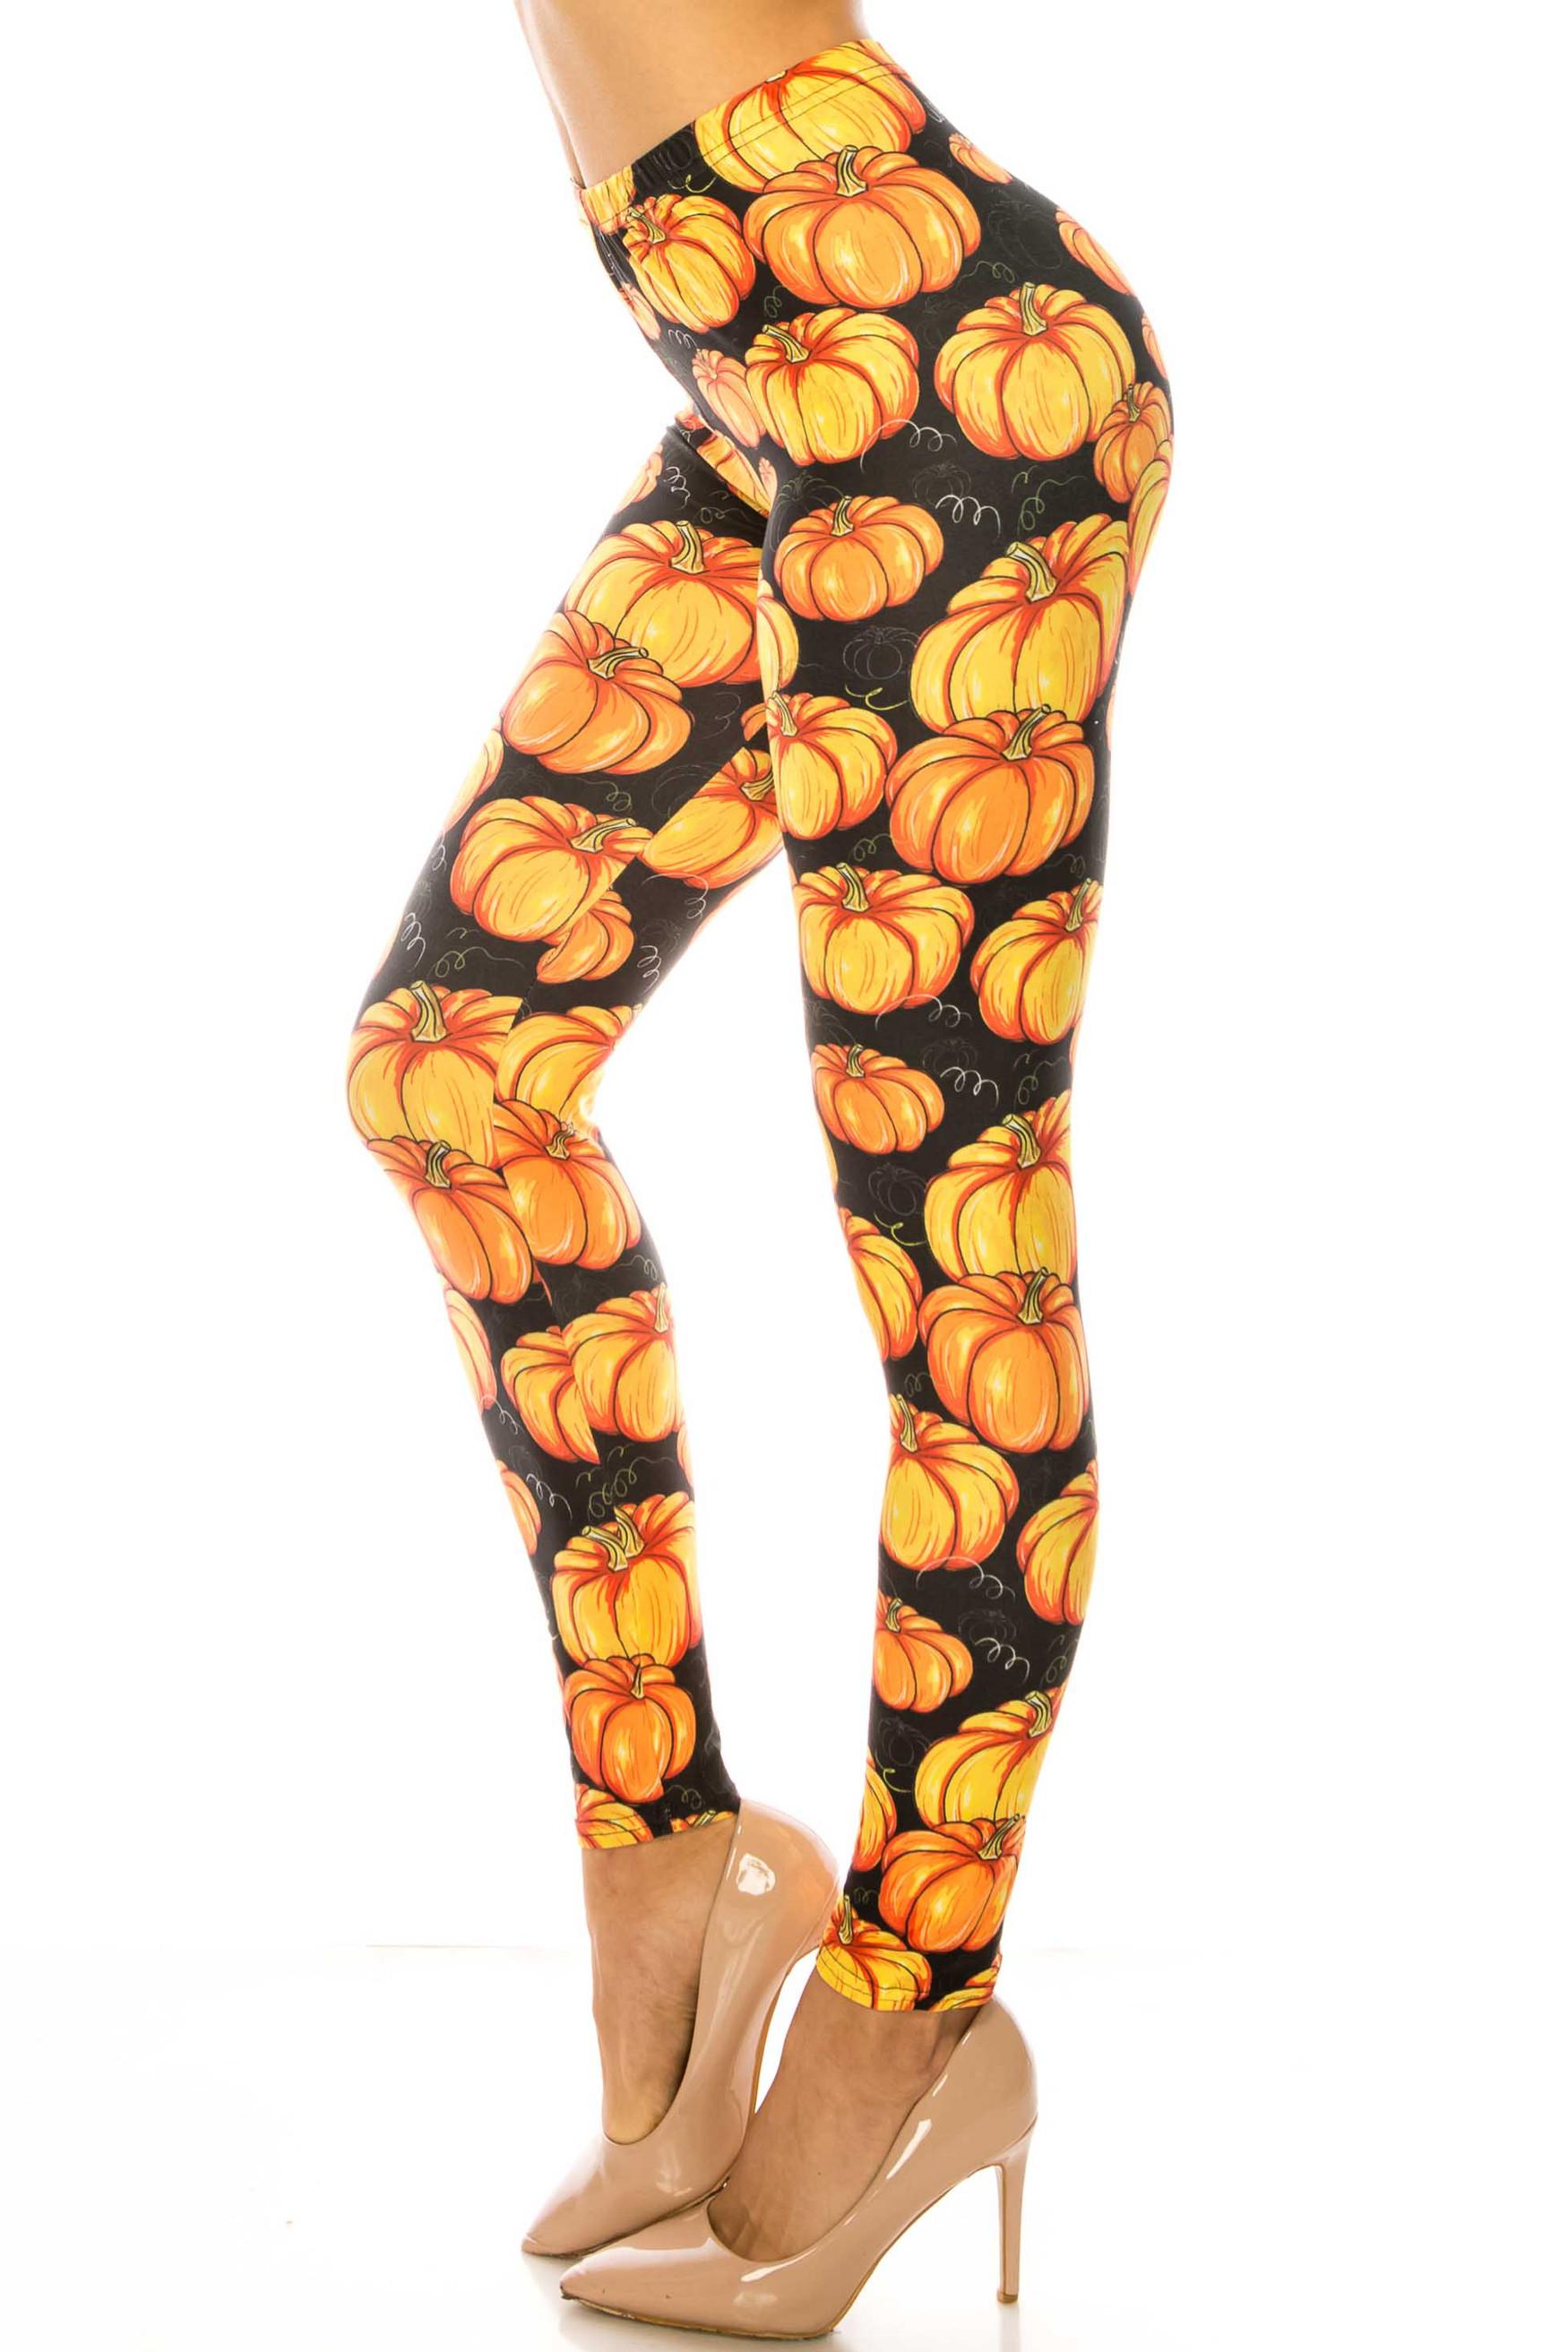 Creamy Soft Autumnal Pumpkins Kids Leggings - USA Fashion™